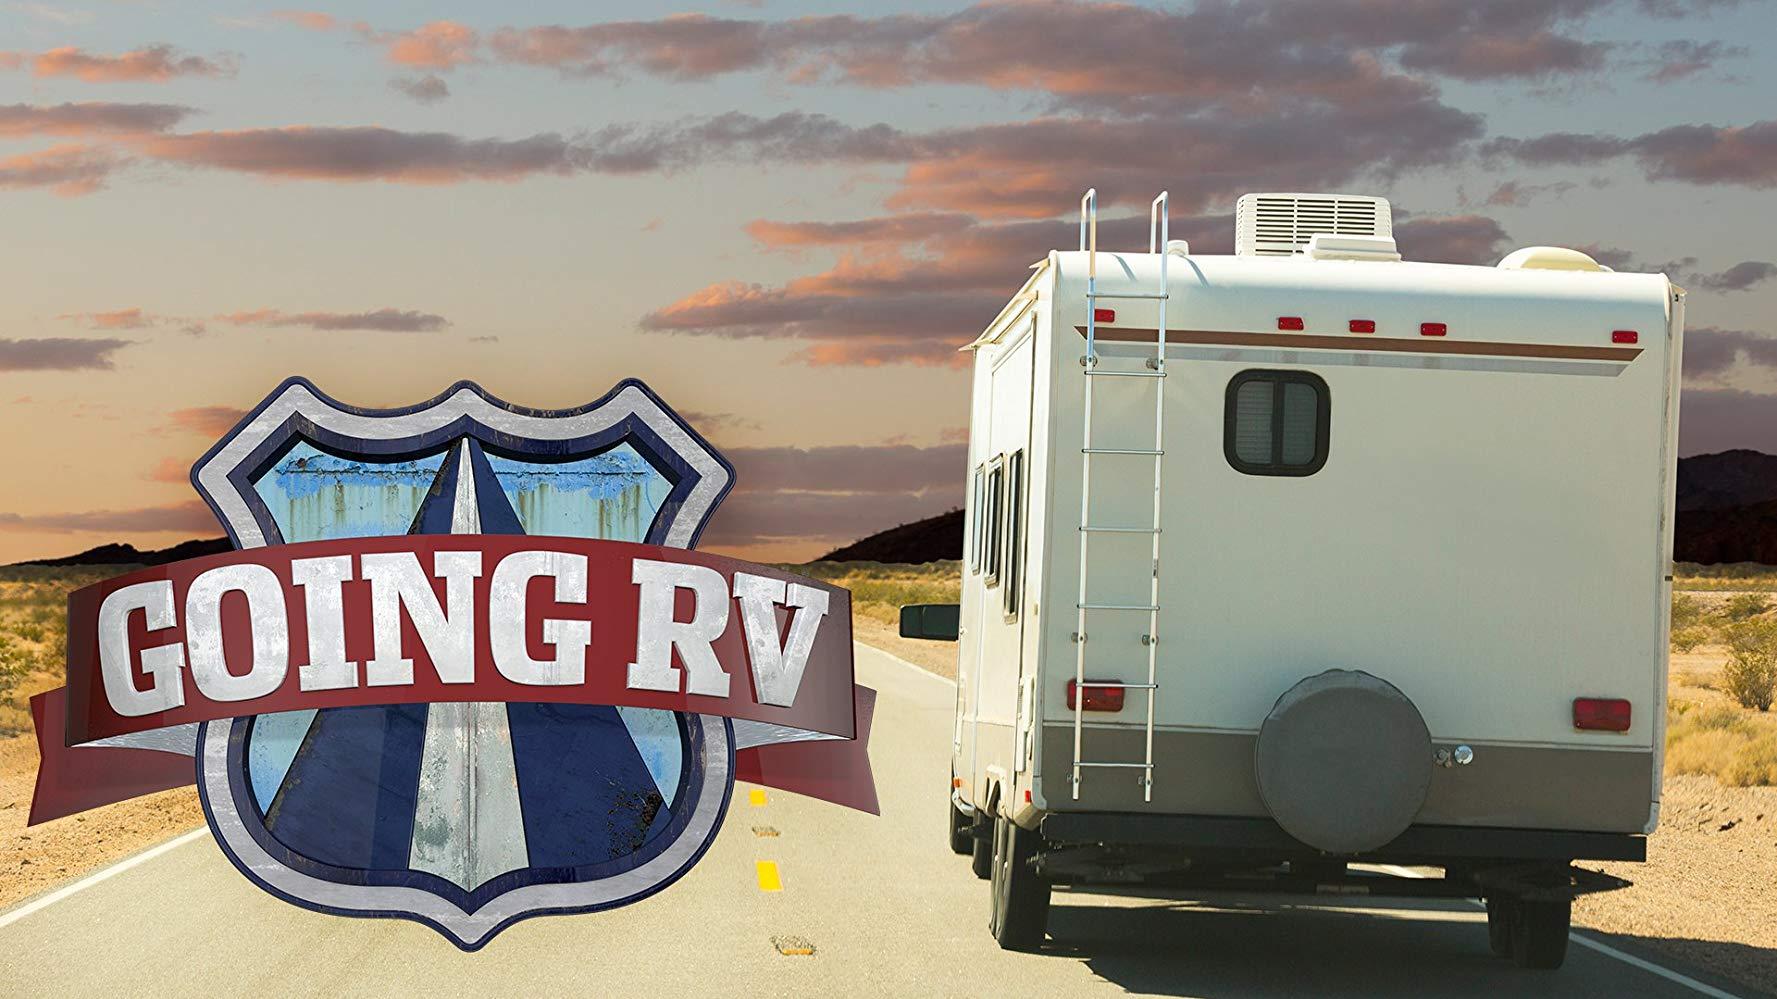 Going RV S01E12 HDTV x264-dotTV